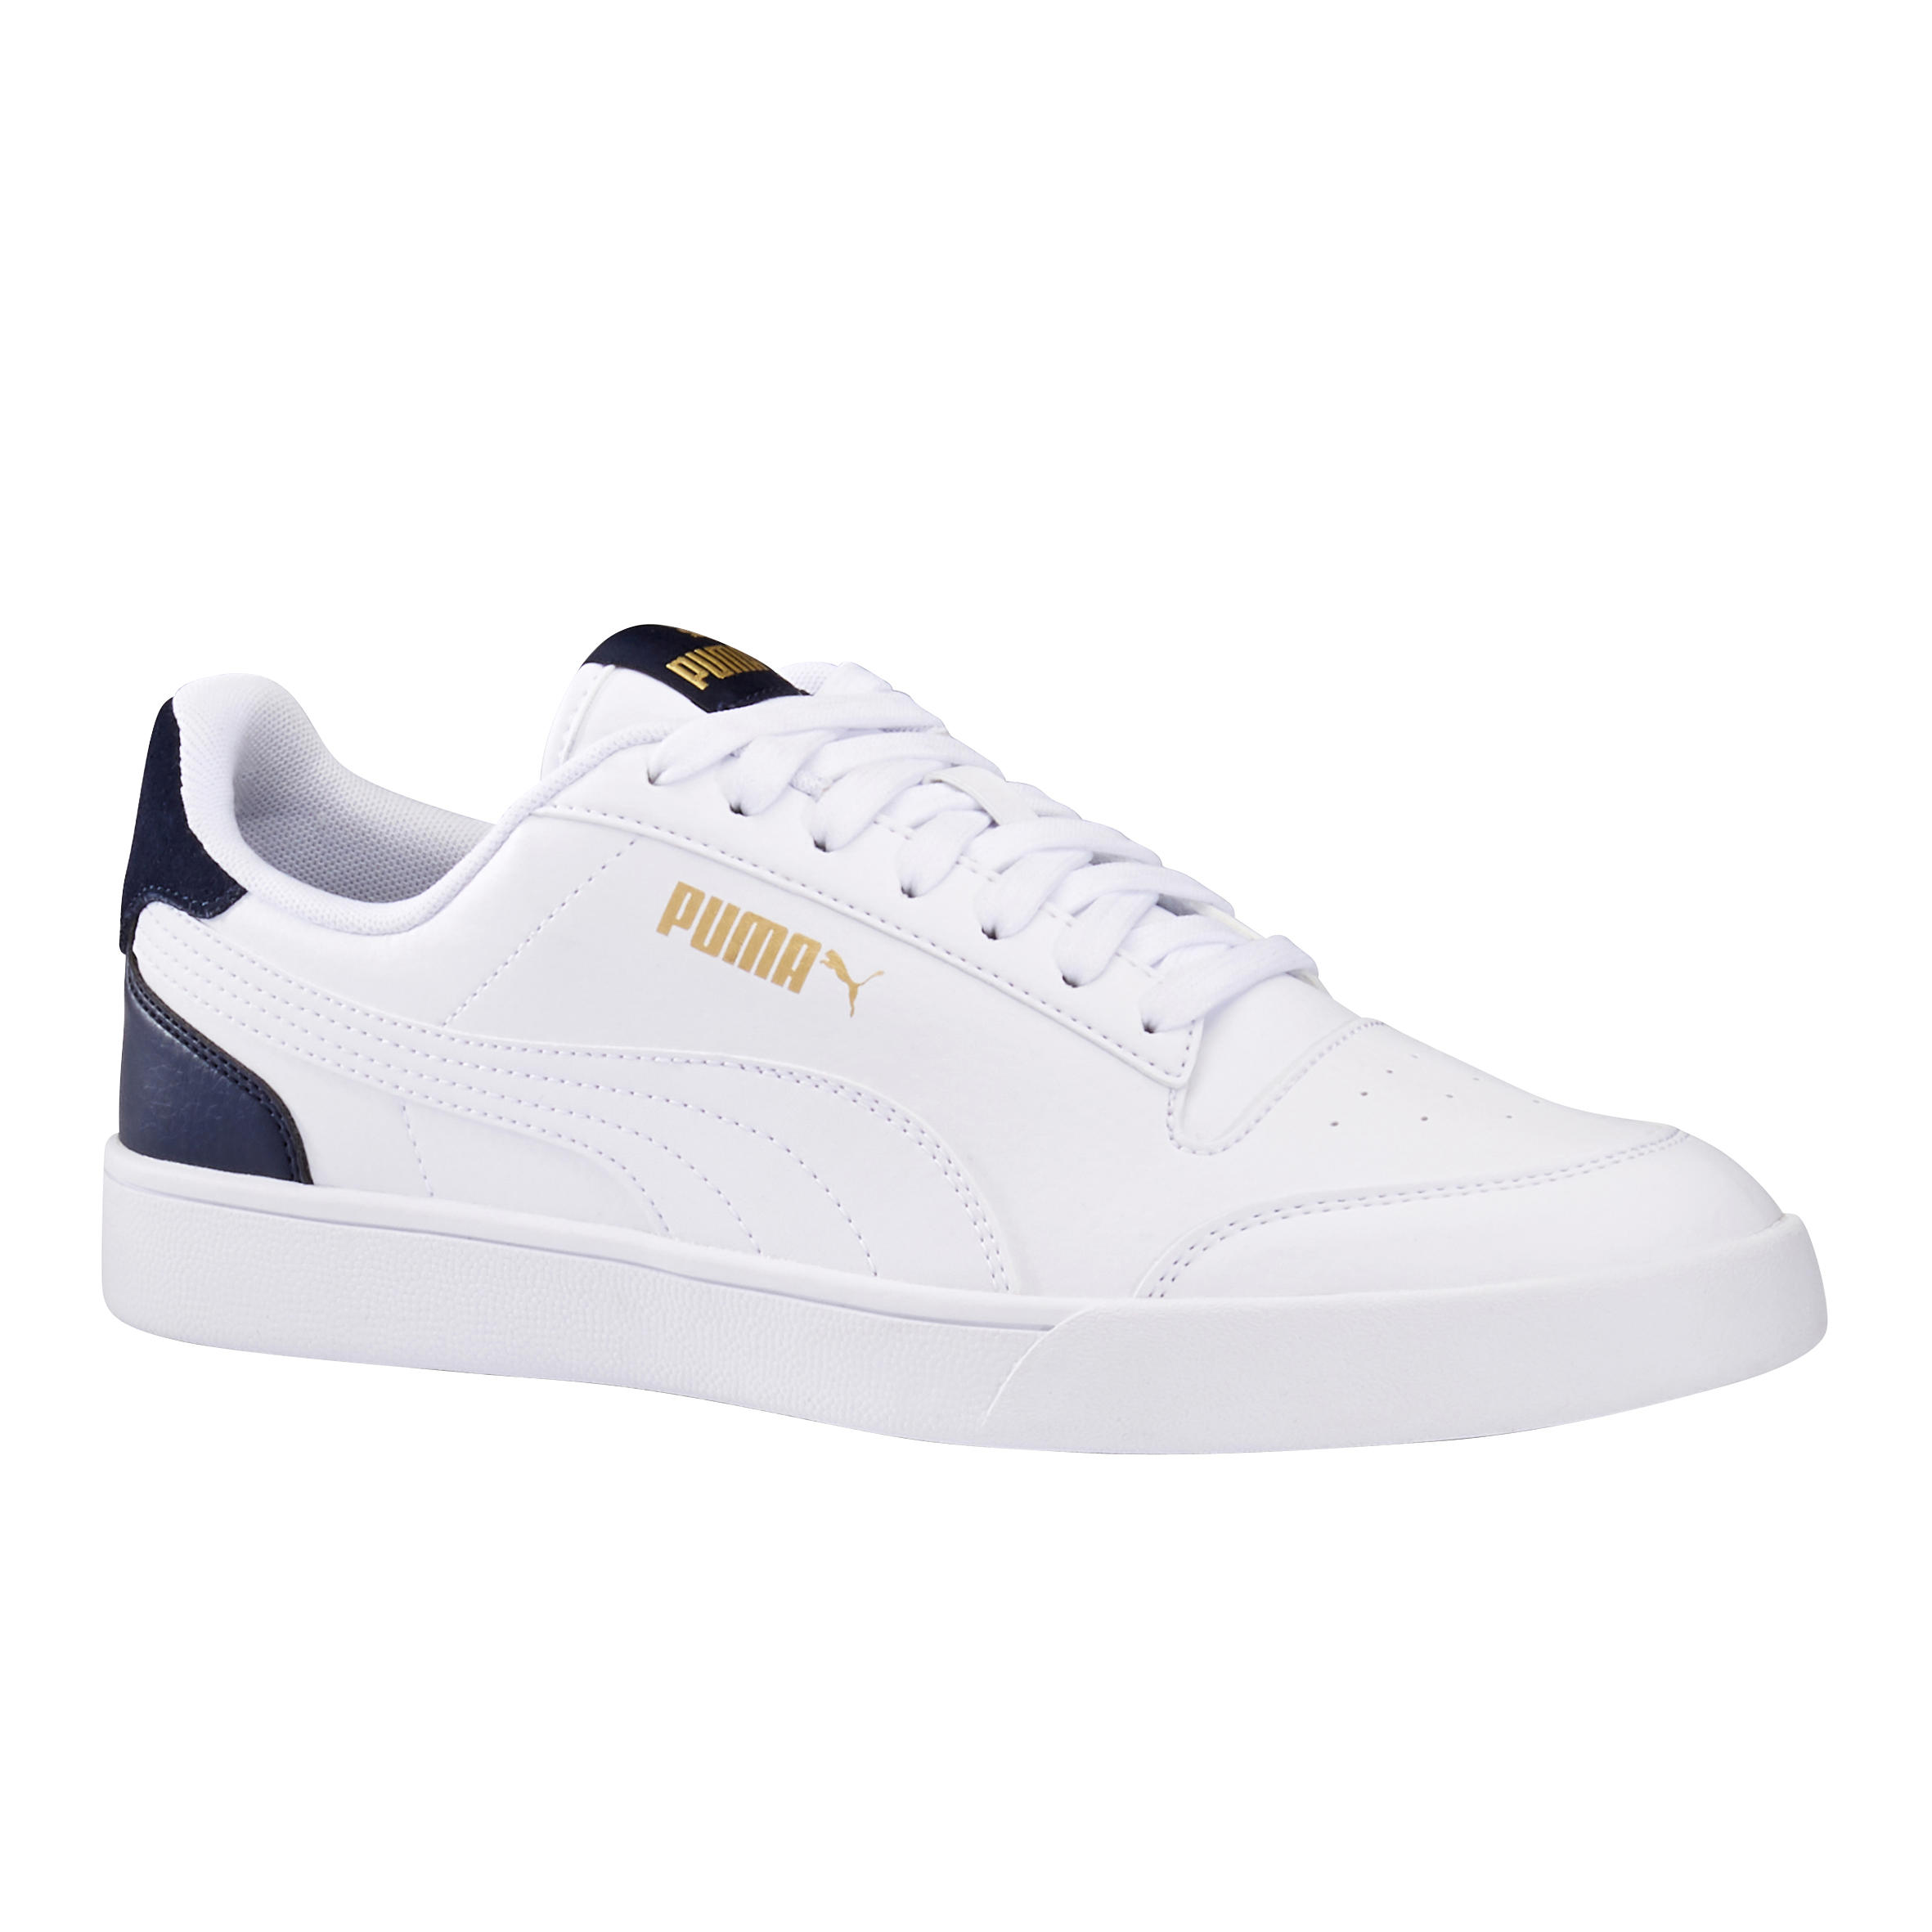 Chaussures marche active homme Puma Shuffle blanc / bleu